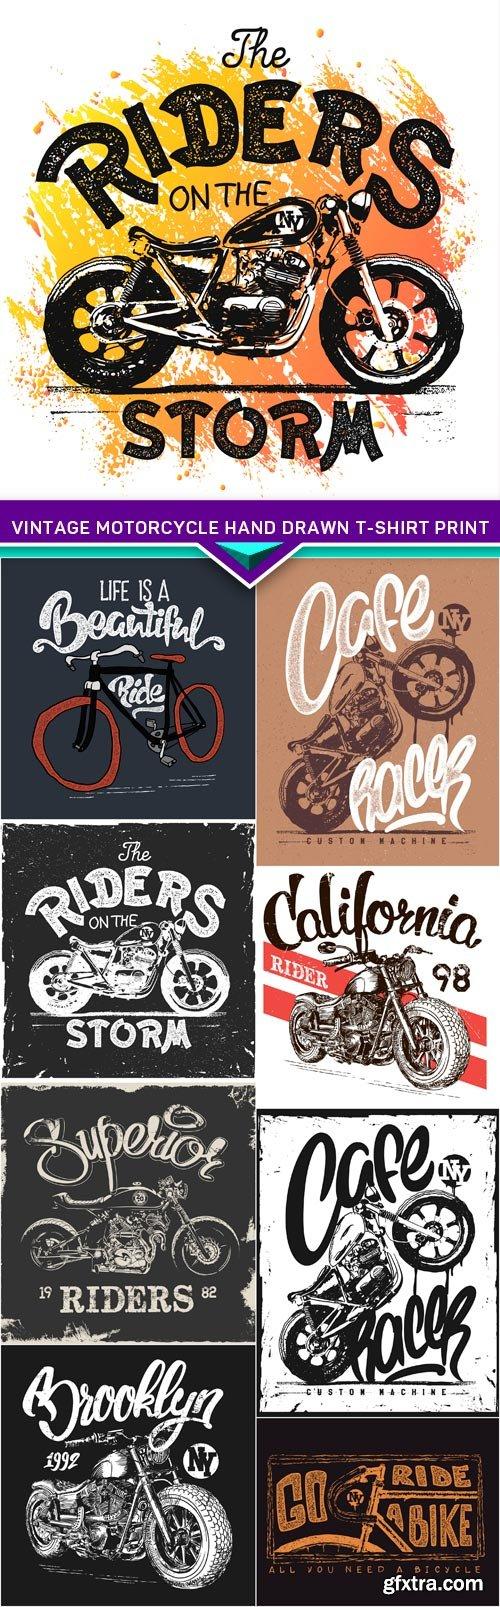 Vintage Motorcycle hand drawn t-shirt print 9X EPS